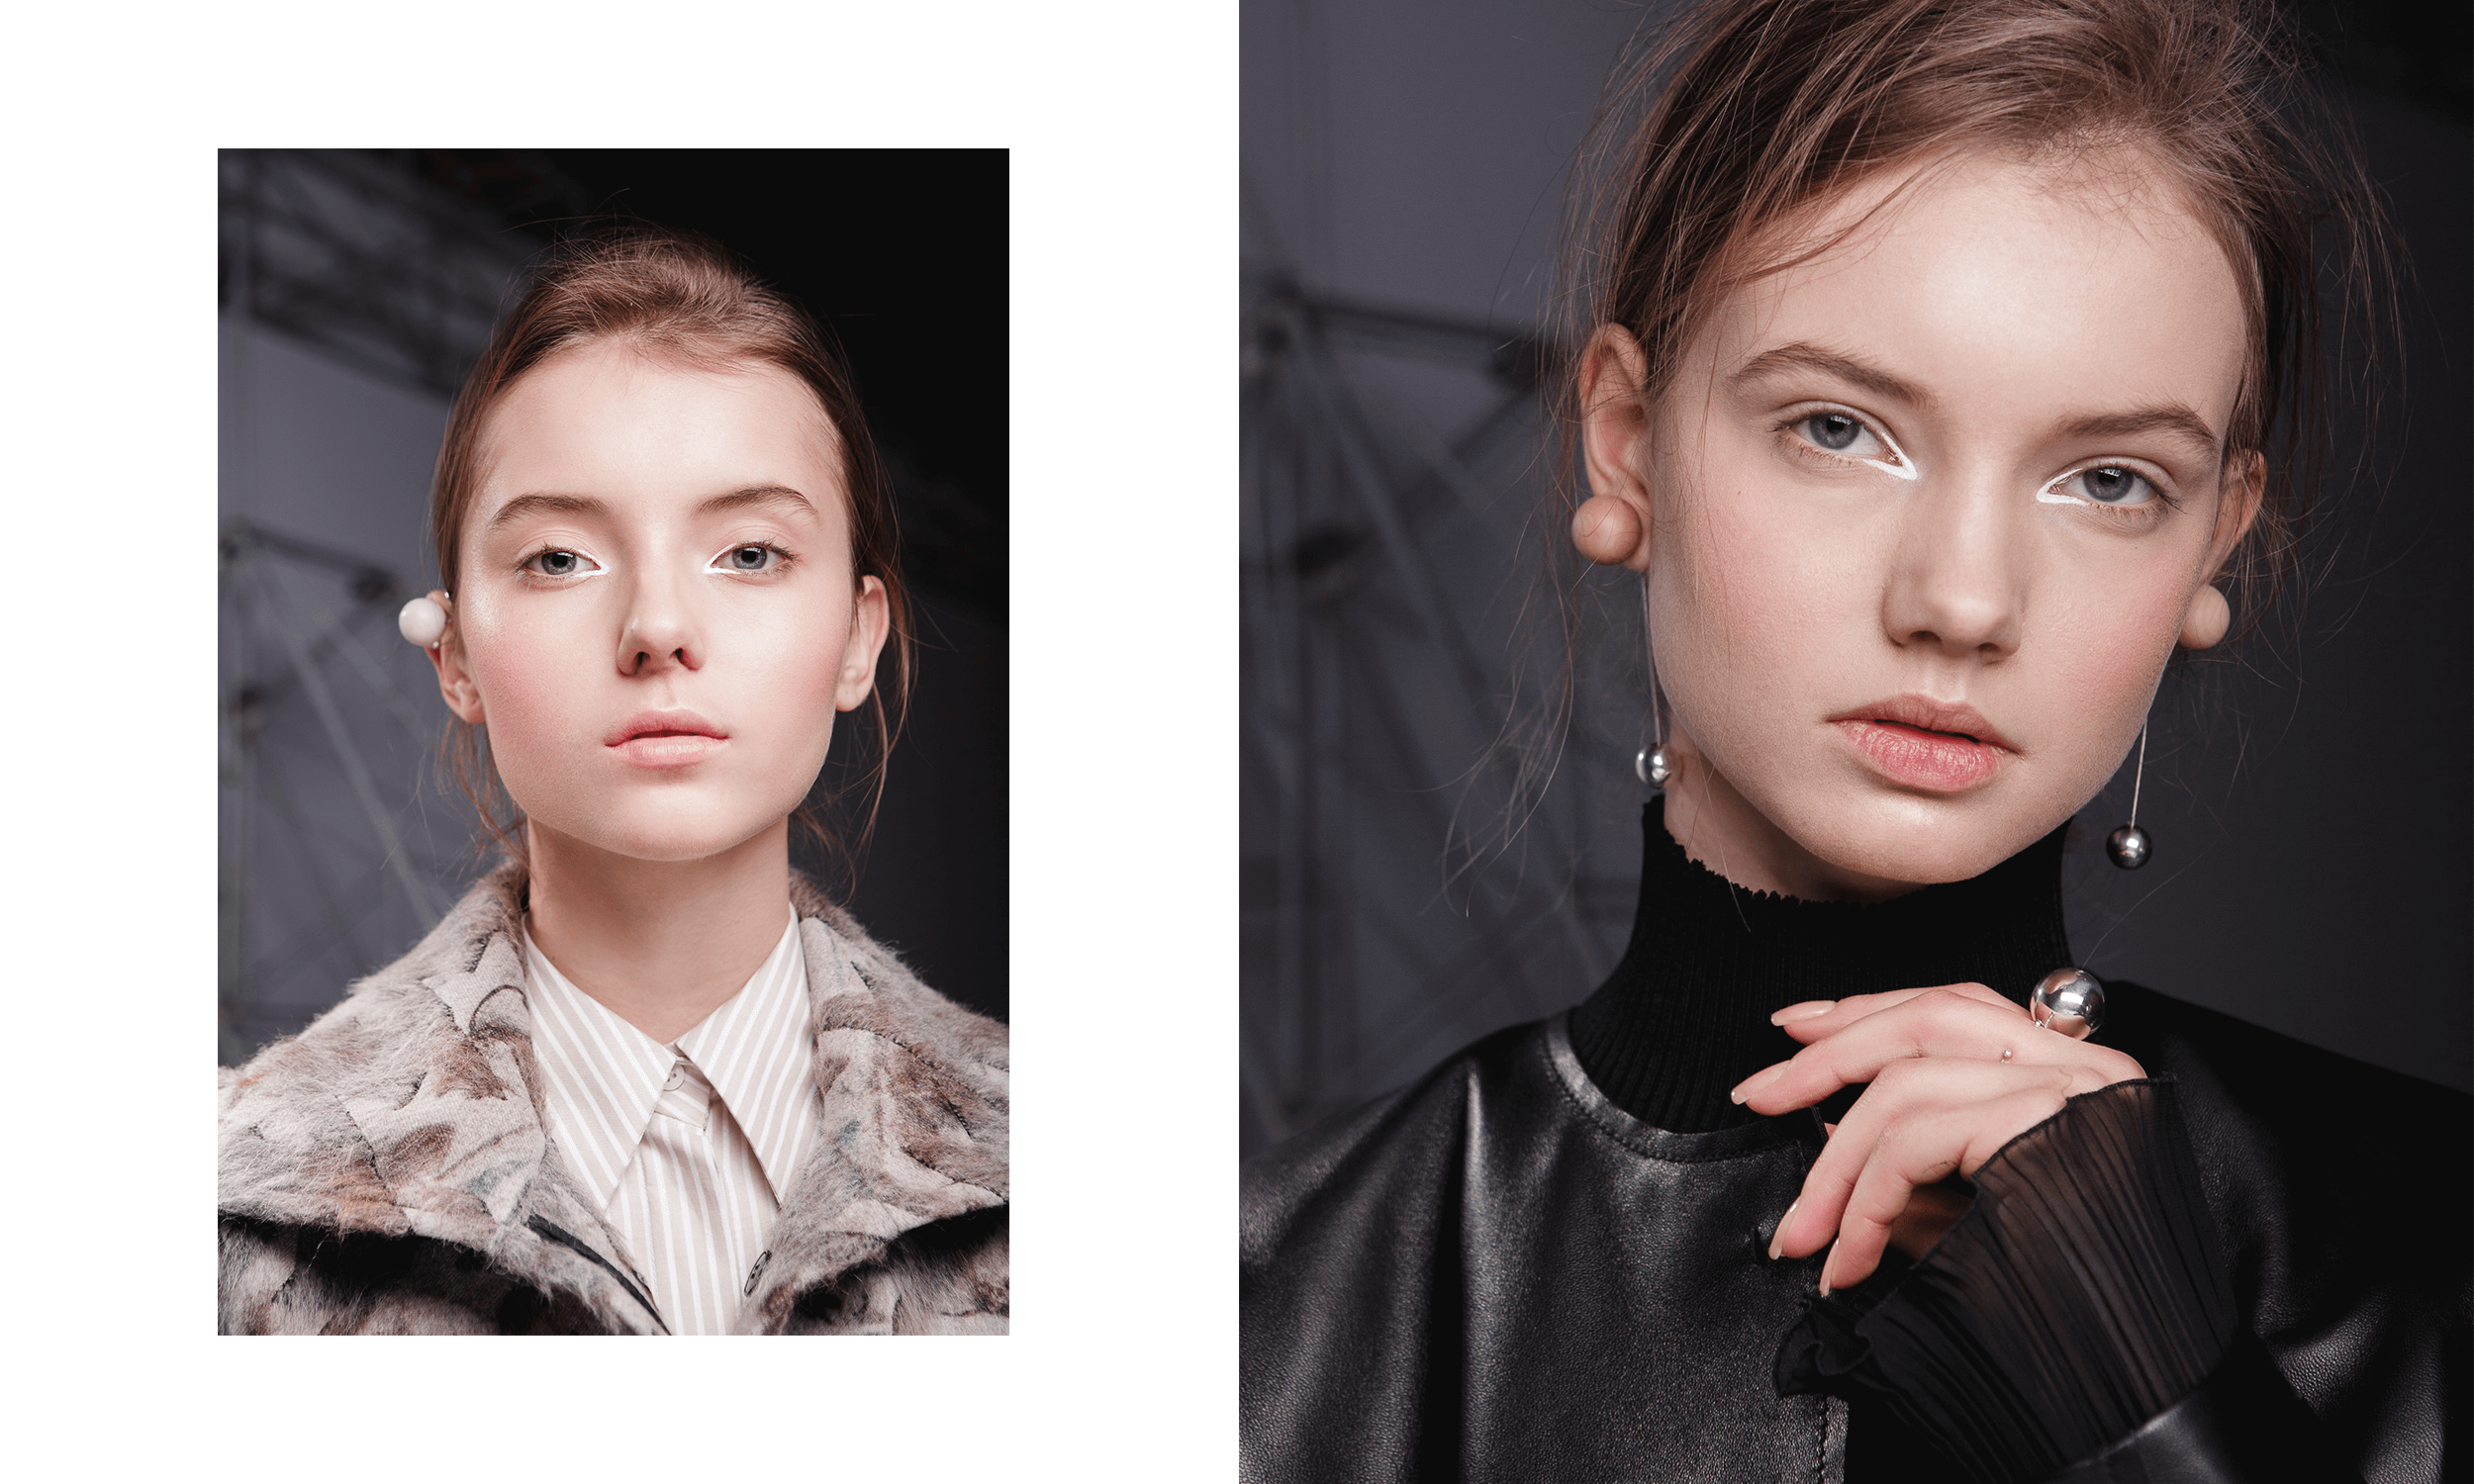 Sisley_Paris_for_Litkovskaya_FW_17_Release_22.png